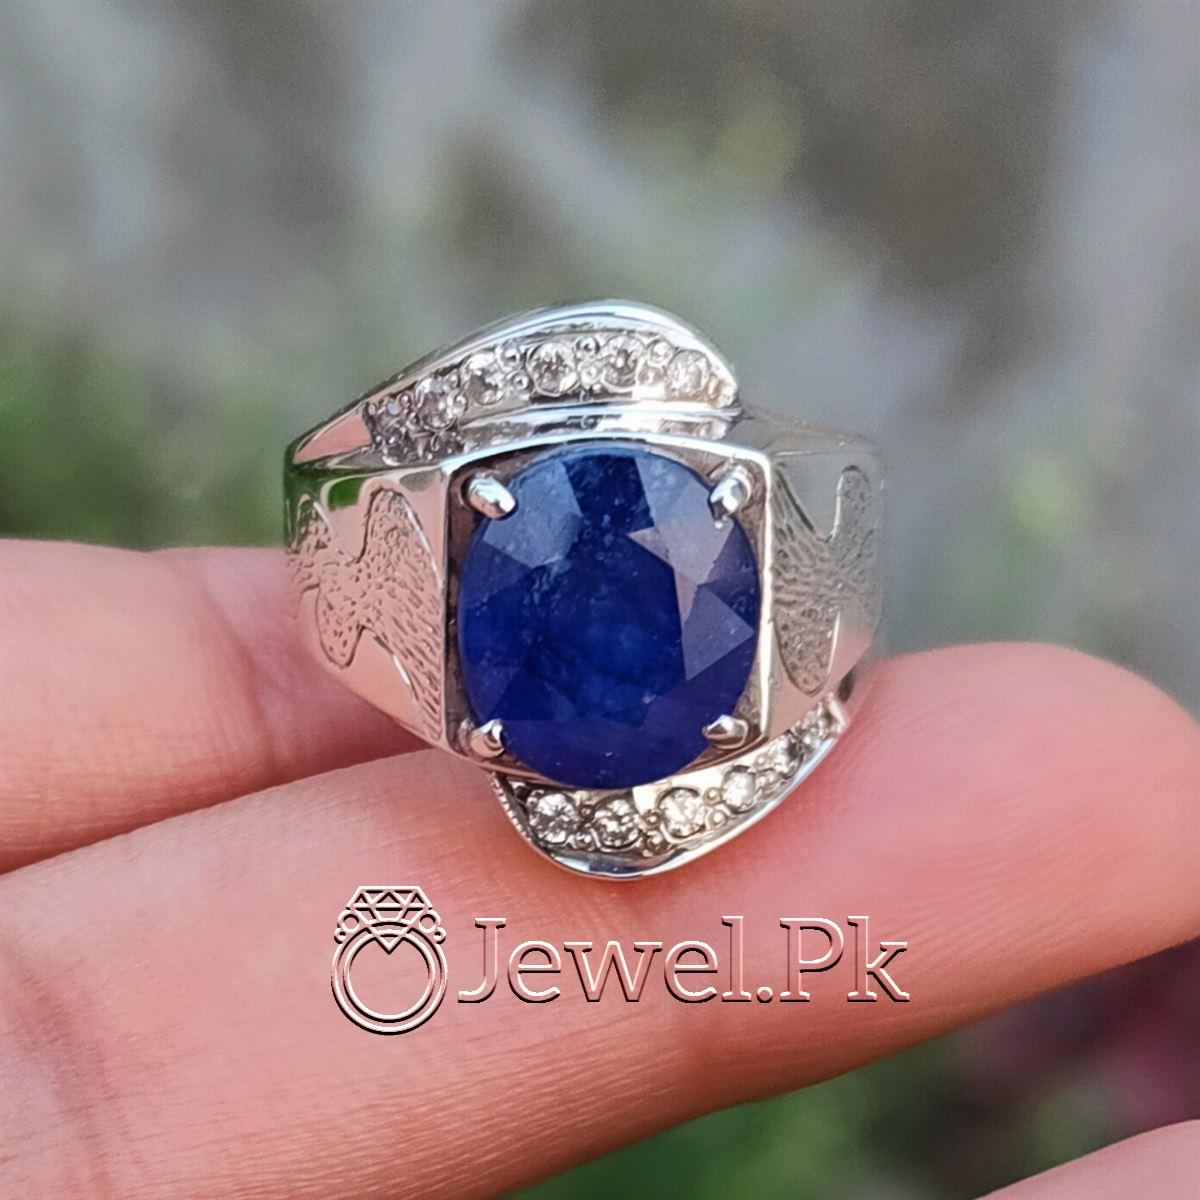 Natural Blue Sapphire Ring 925 Silver Chandi Handmade 5 natural gemstones pakistan + 925 silver jewelry online